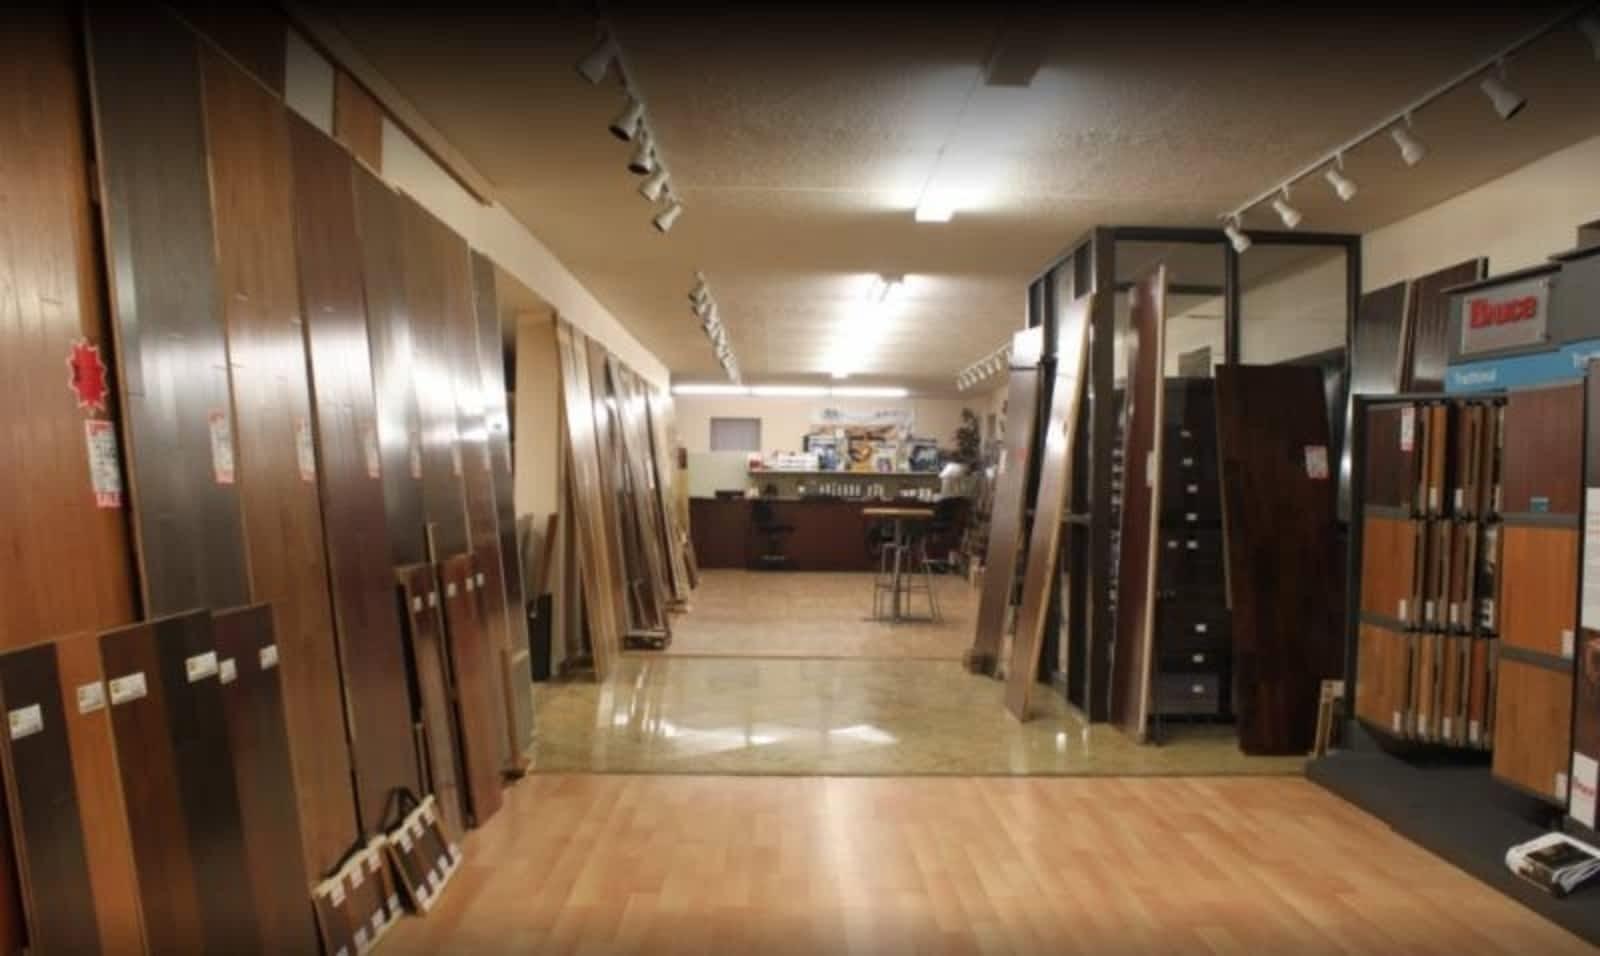 13 Wonderful Fuzion Engineered Hardwood Flooring Reviews 2021 free download fuzion engineered hardwood flooring reviews of aa floors and more opening hours 524 evans ave etobicoke on pertaining to aa floors and more 5